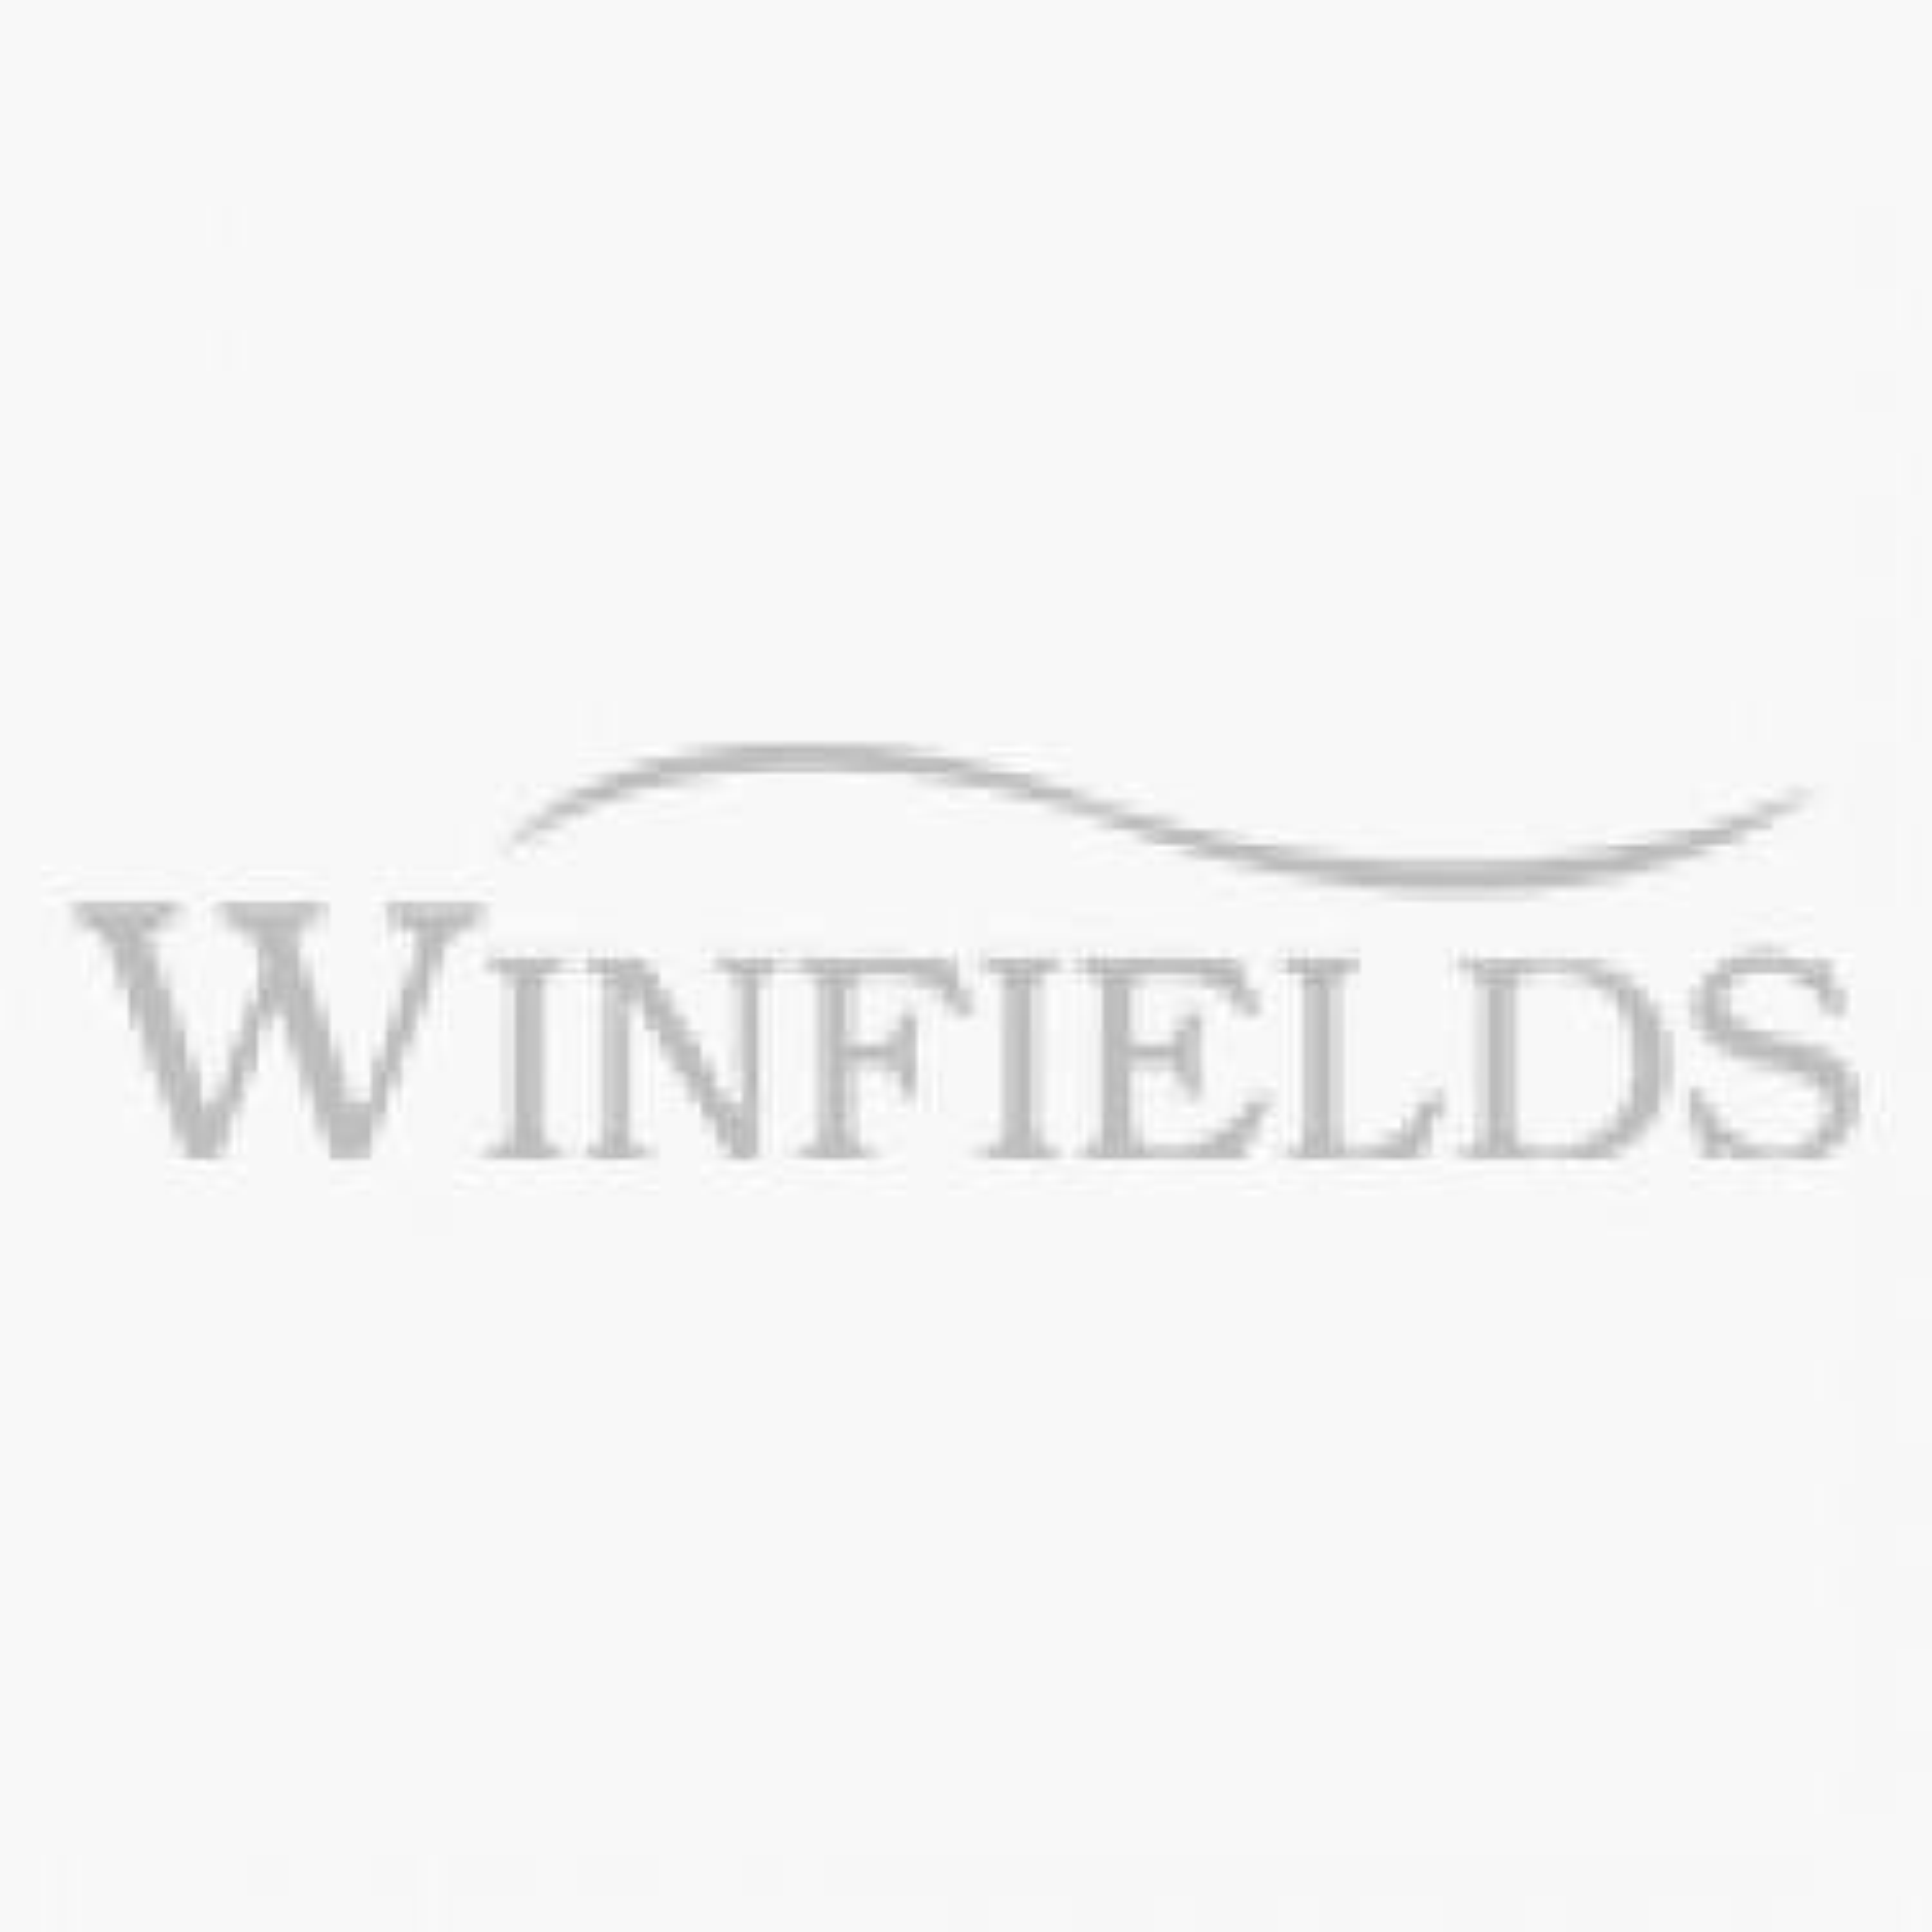 Craghoppers Mens Classic Kiwi Trousers - Bark - 36l